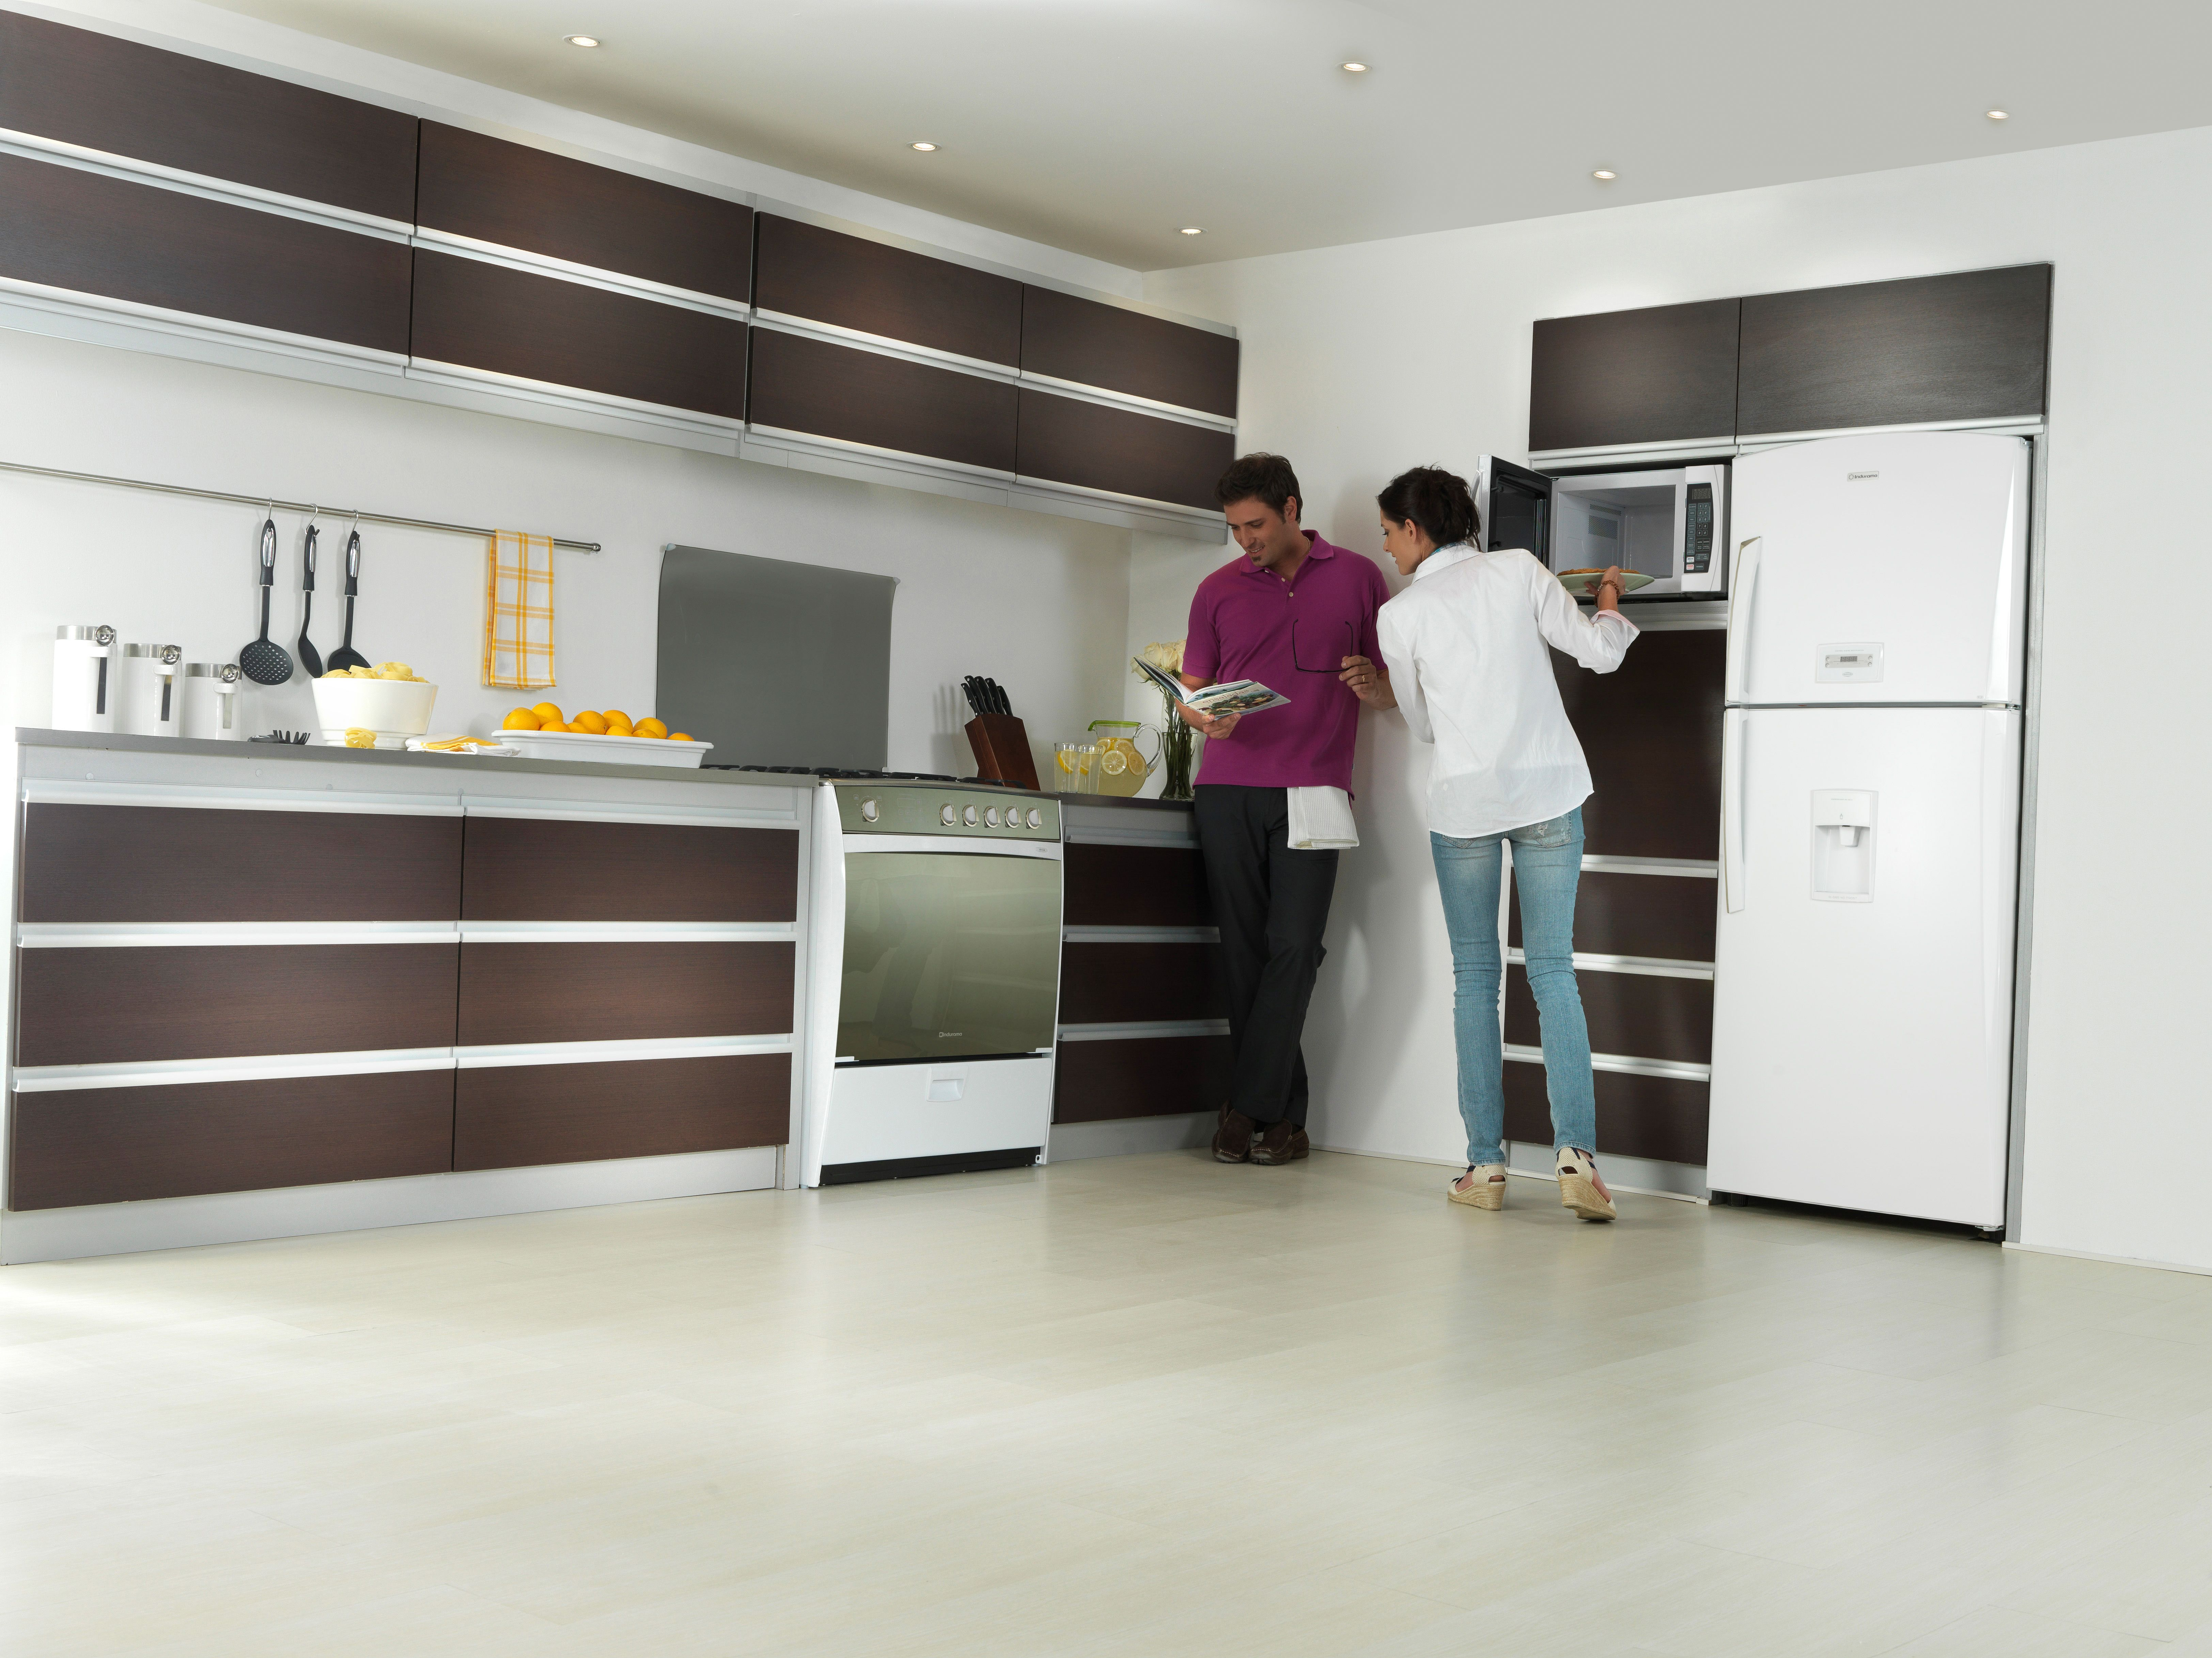 Cocina Genova Quarzo Horno Microondas Refrigeradora Ri 585  ~ Microondas Con Campana Extractora